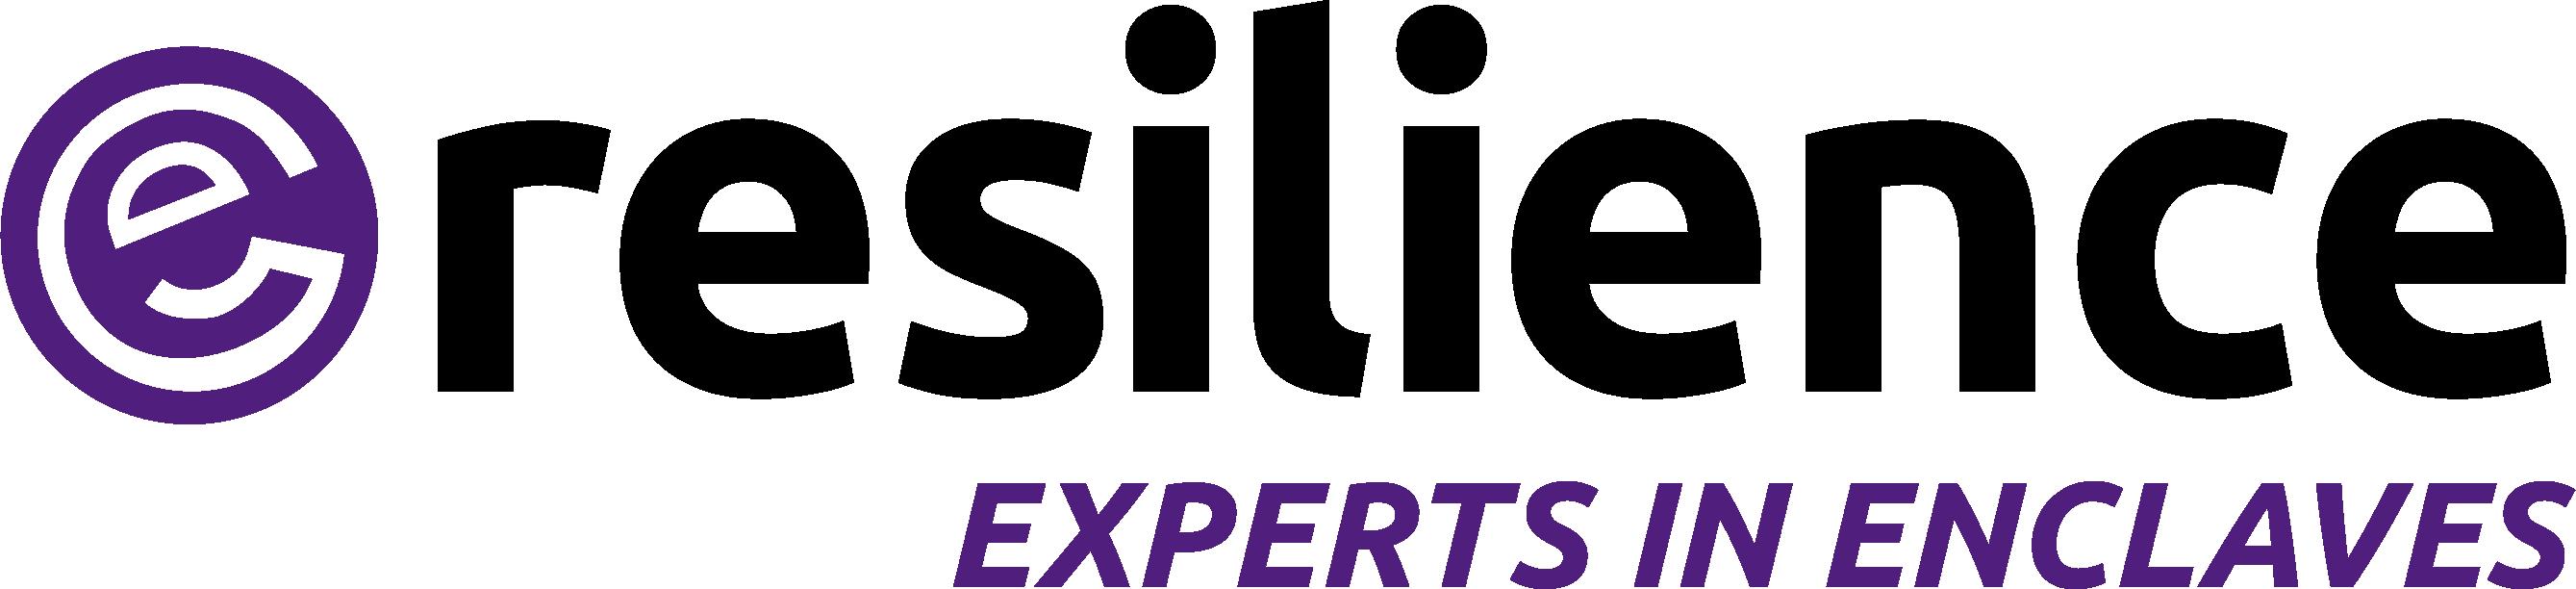 eResilience Logo